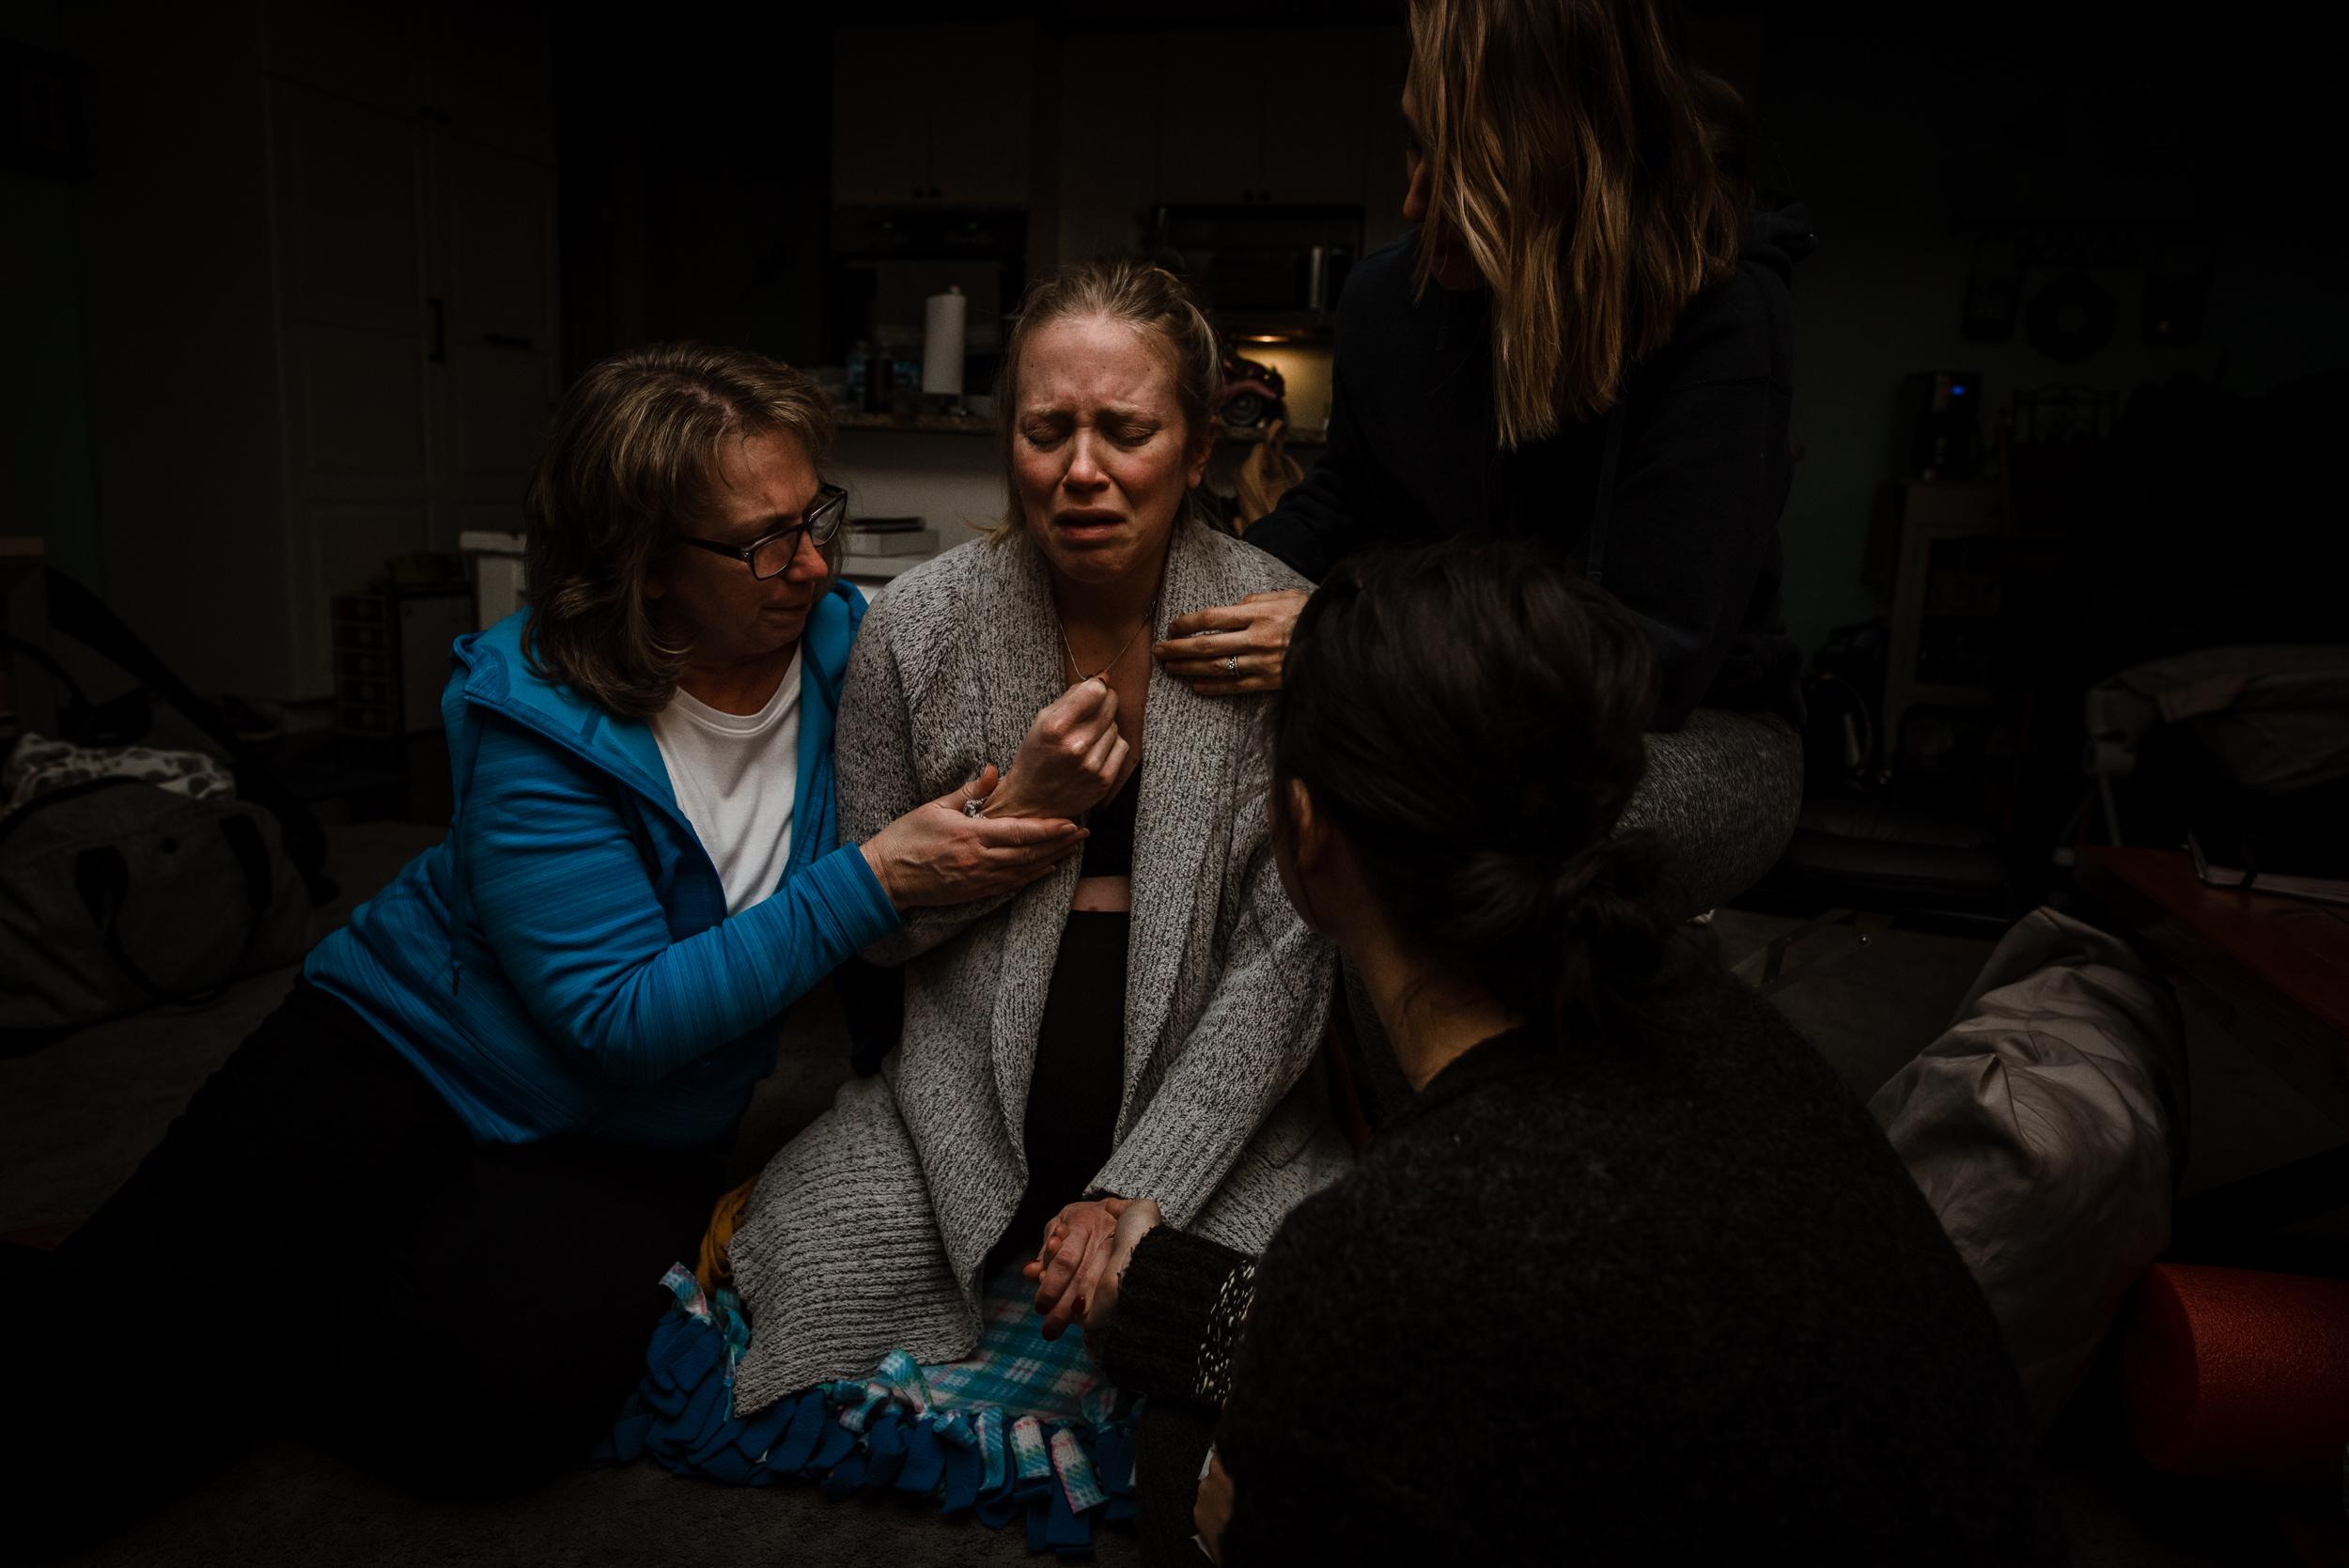 Best Birth Photography Minneapolis St. Paul Minnesota Meredith Westin-December 25, 2018-174815.jpg